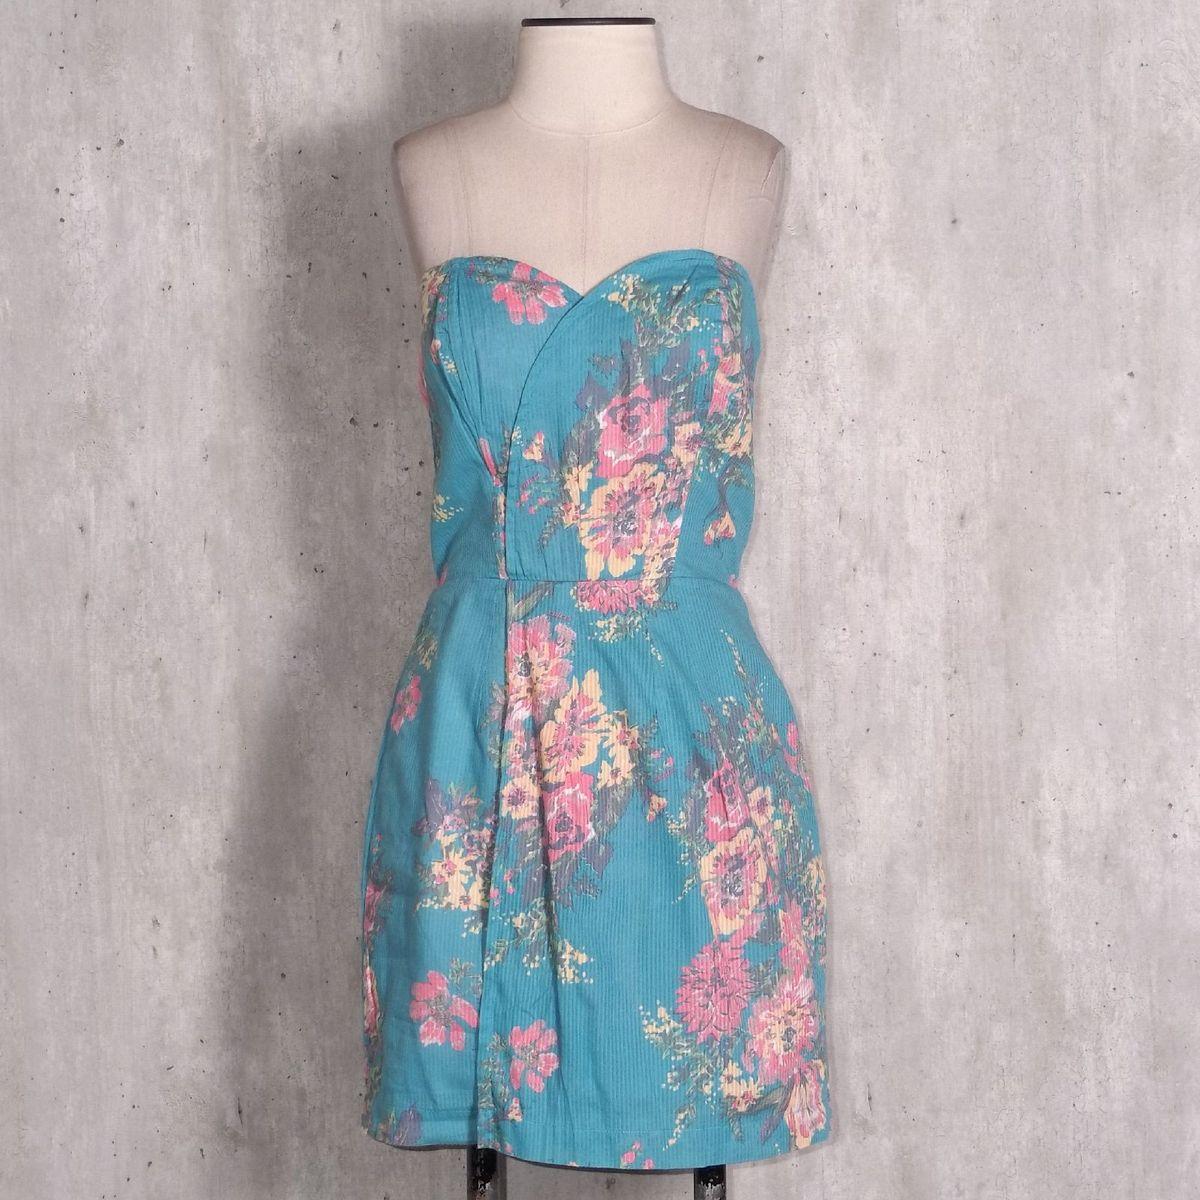 cce53736c Vestido Azul Floral Colcci